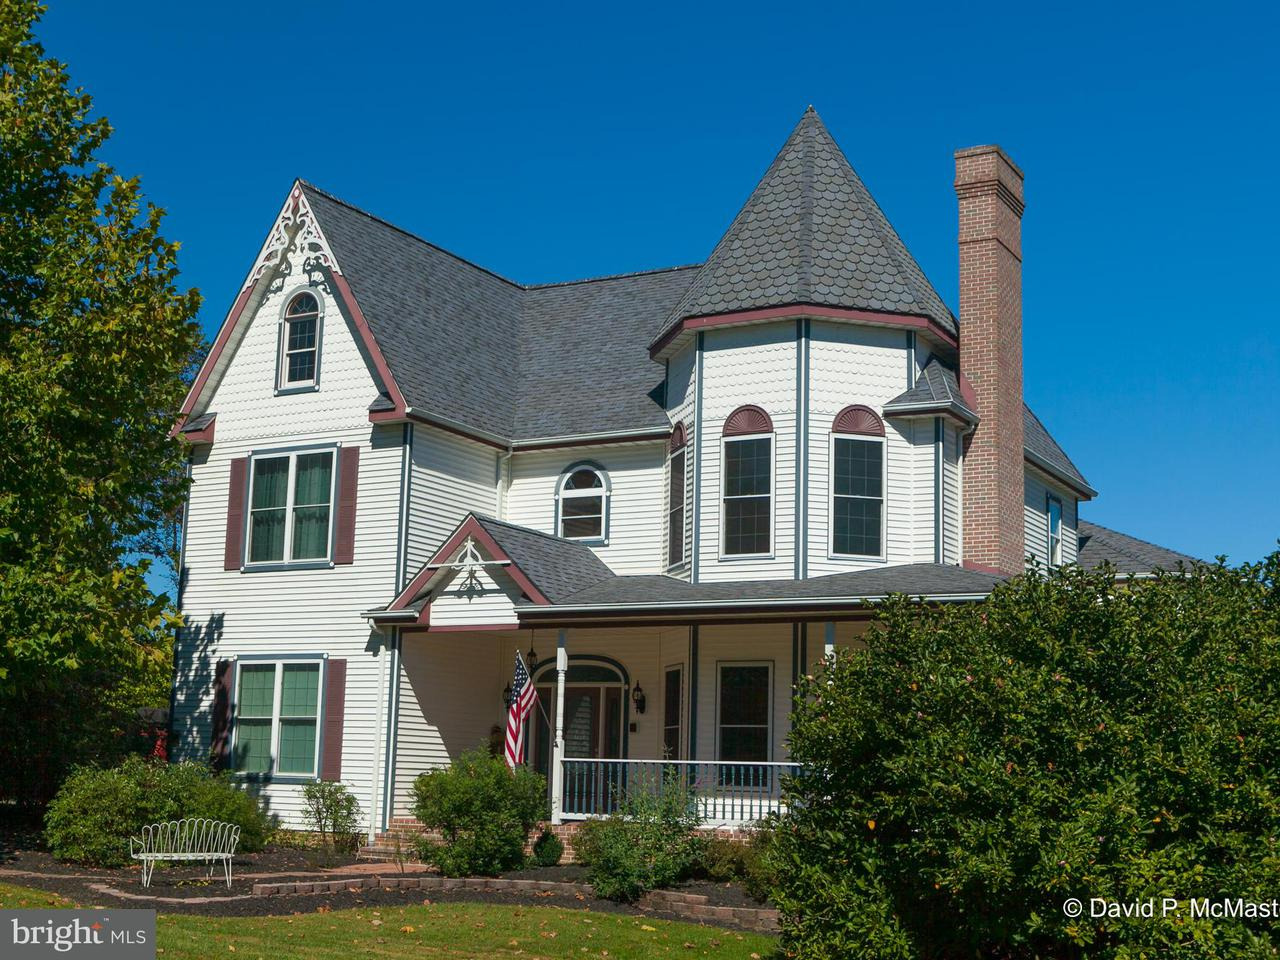 独户住宅 为 销售 在 267 Sweetbriar Road 267 Sweetbriar Road Martinsburg, 西弗吉尼亚州 25405 美国